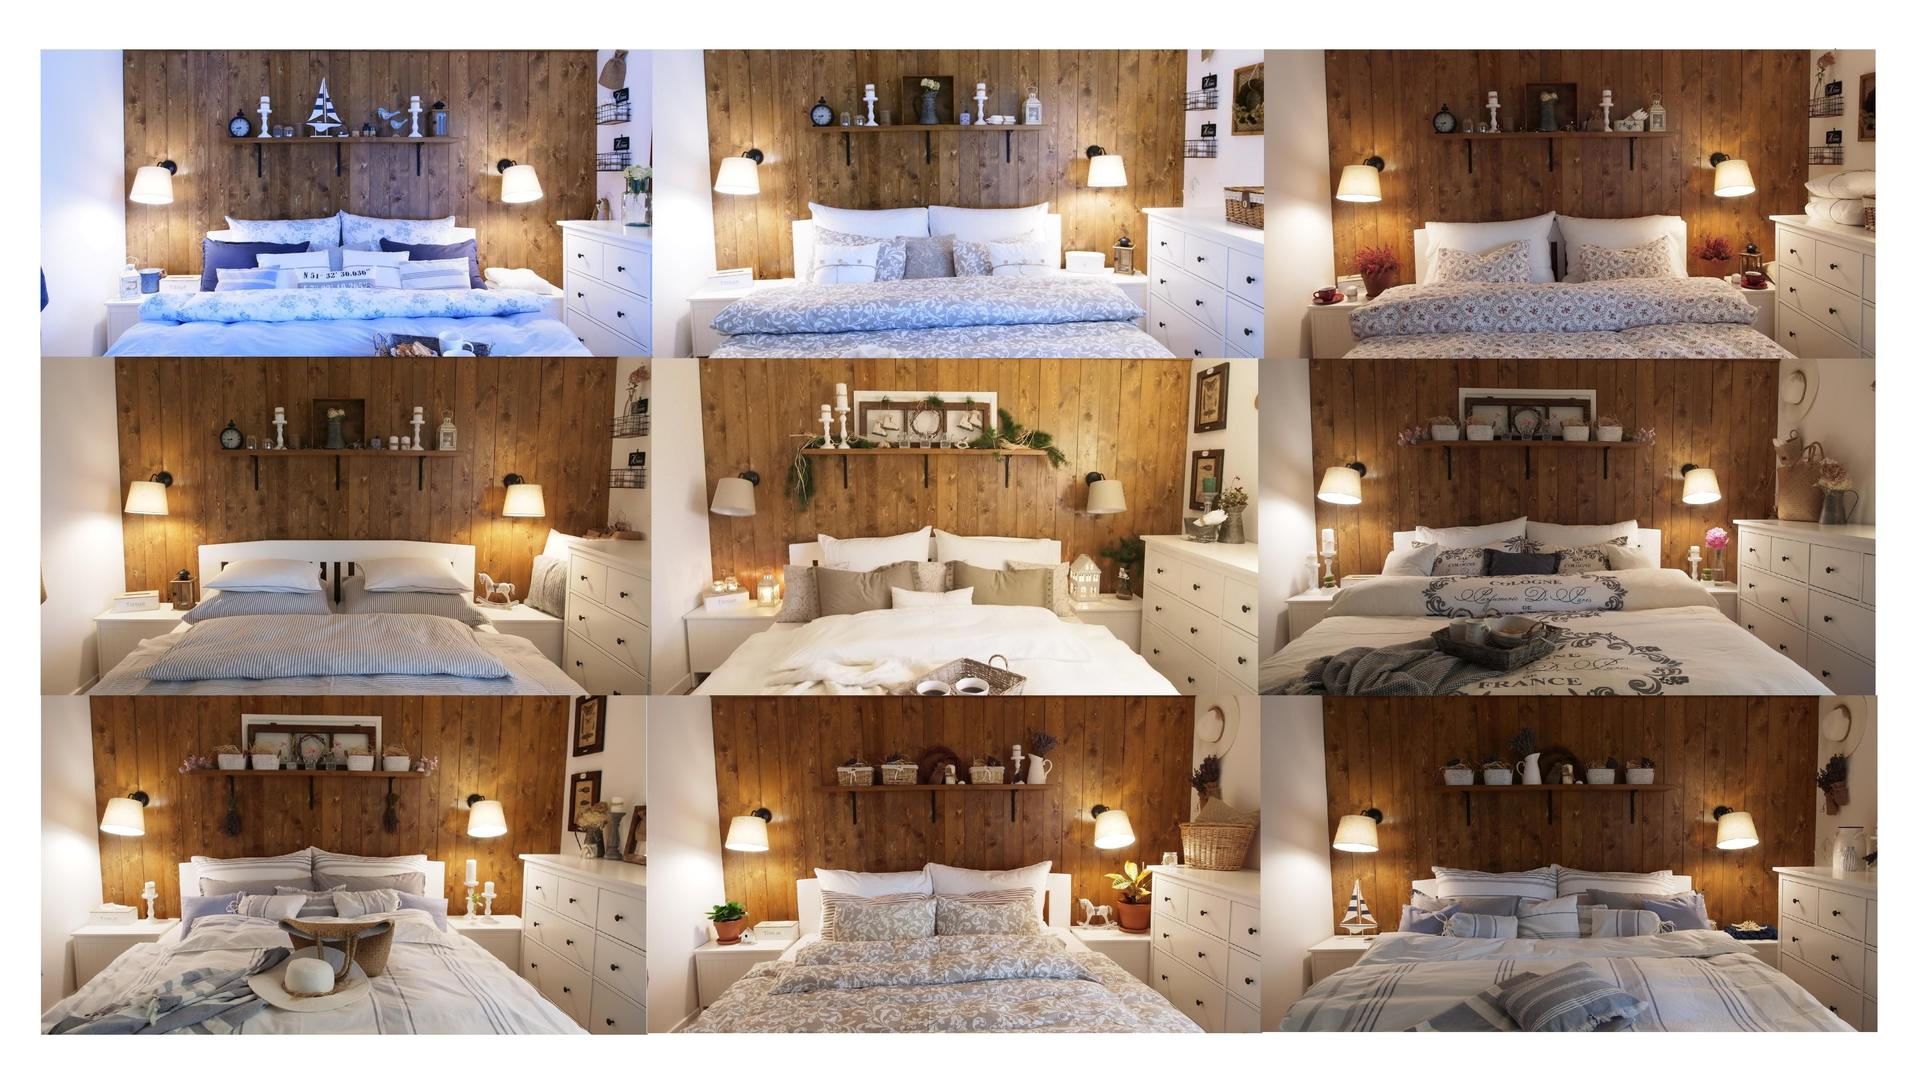 Spálňa - zmena - Obrázok č. 1